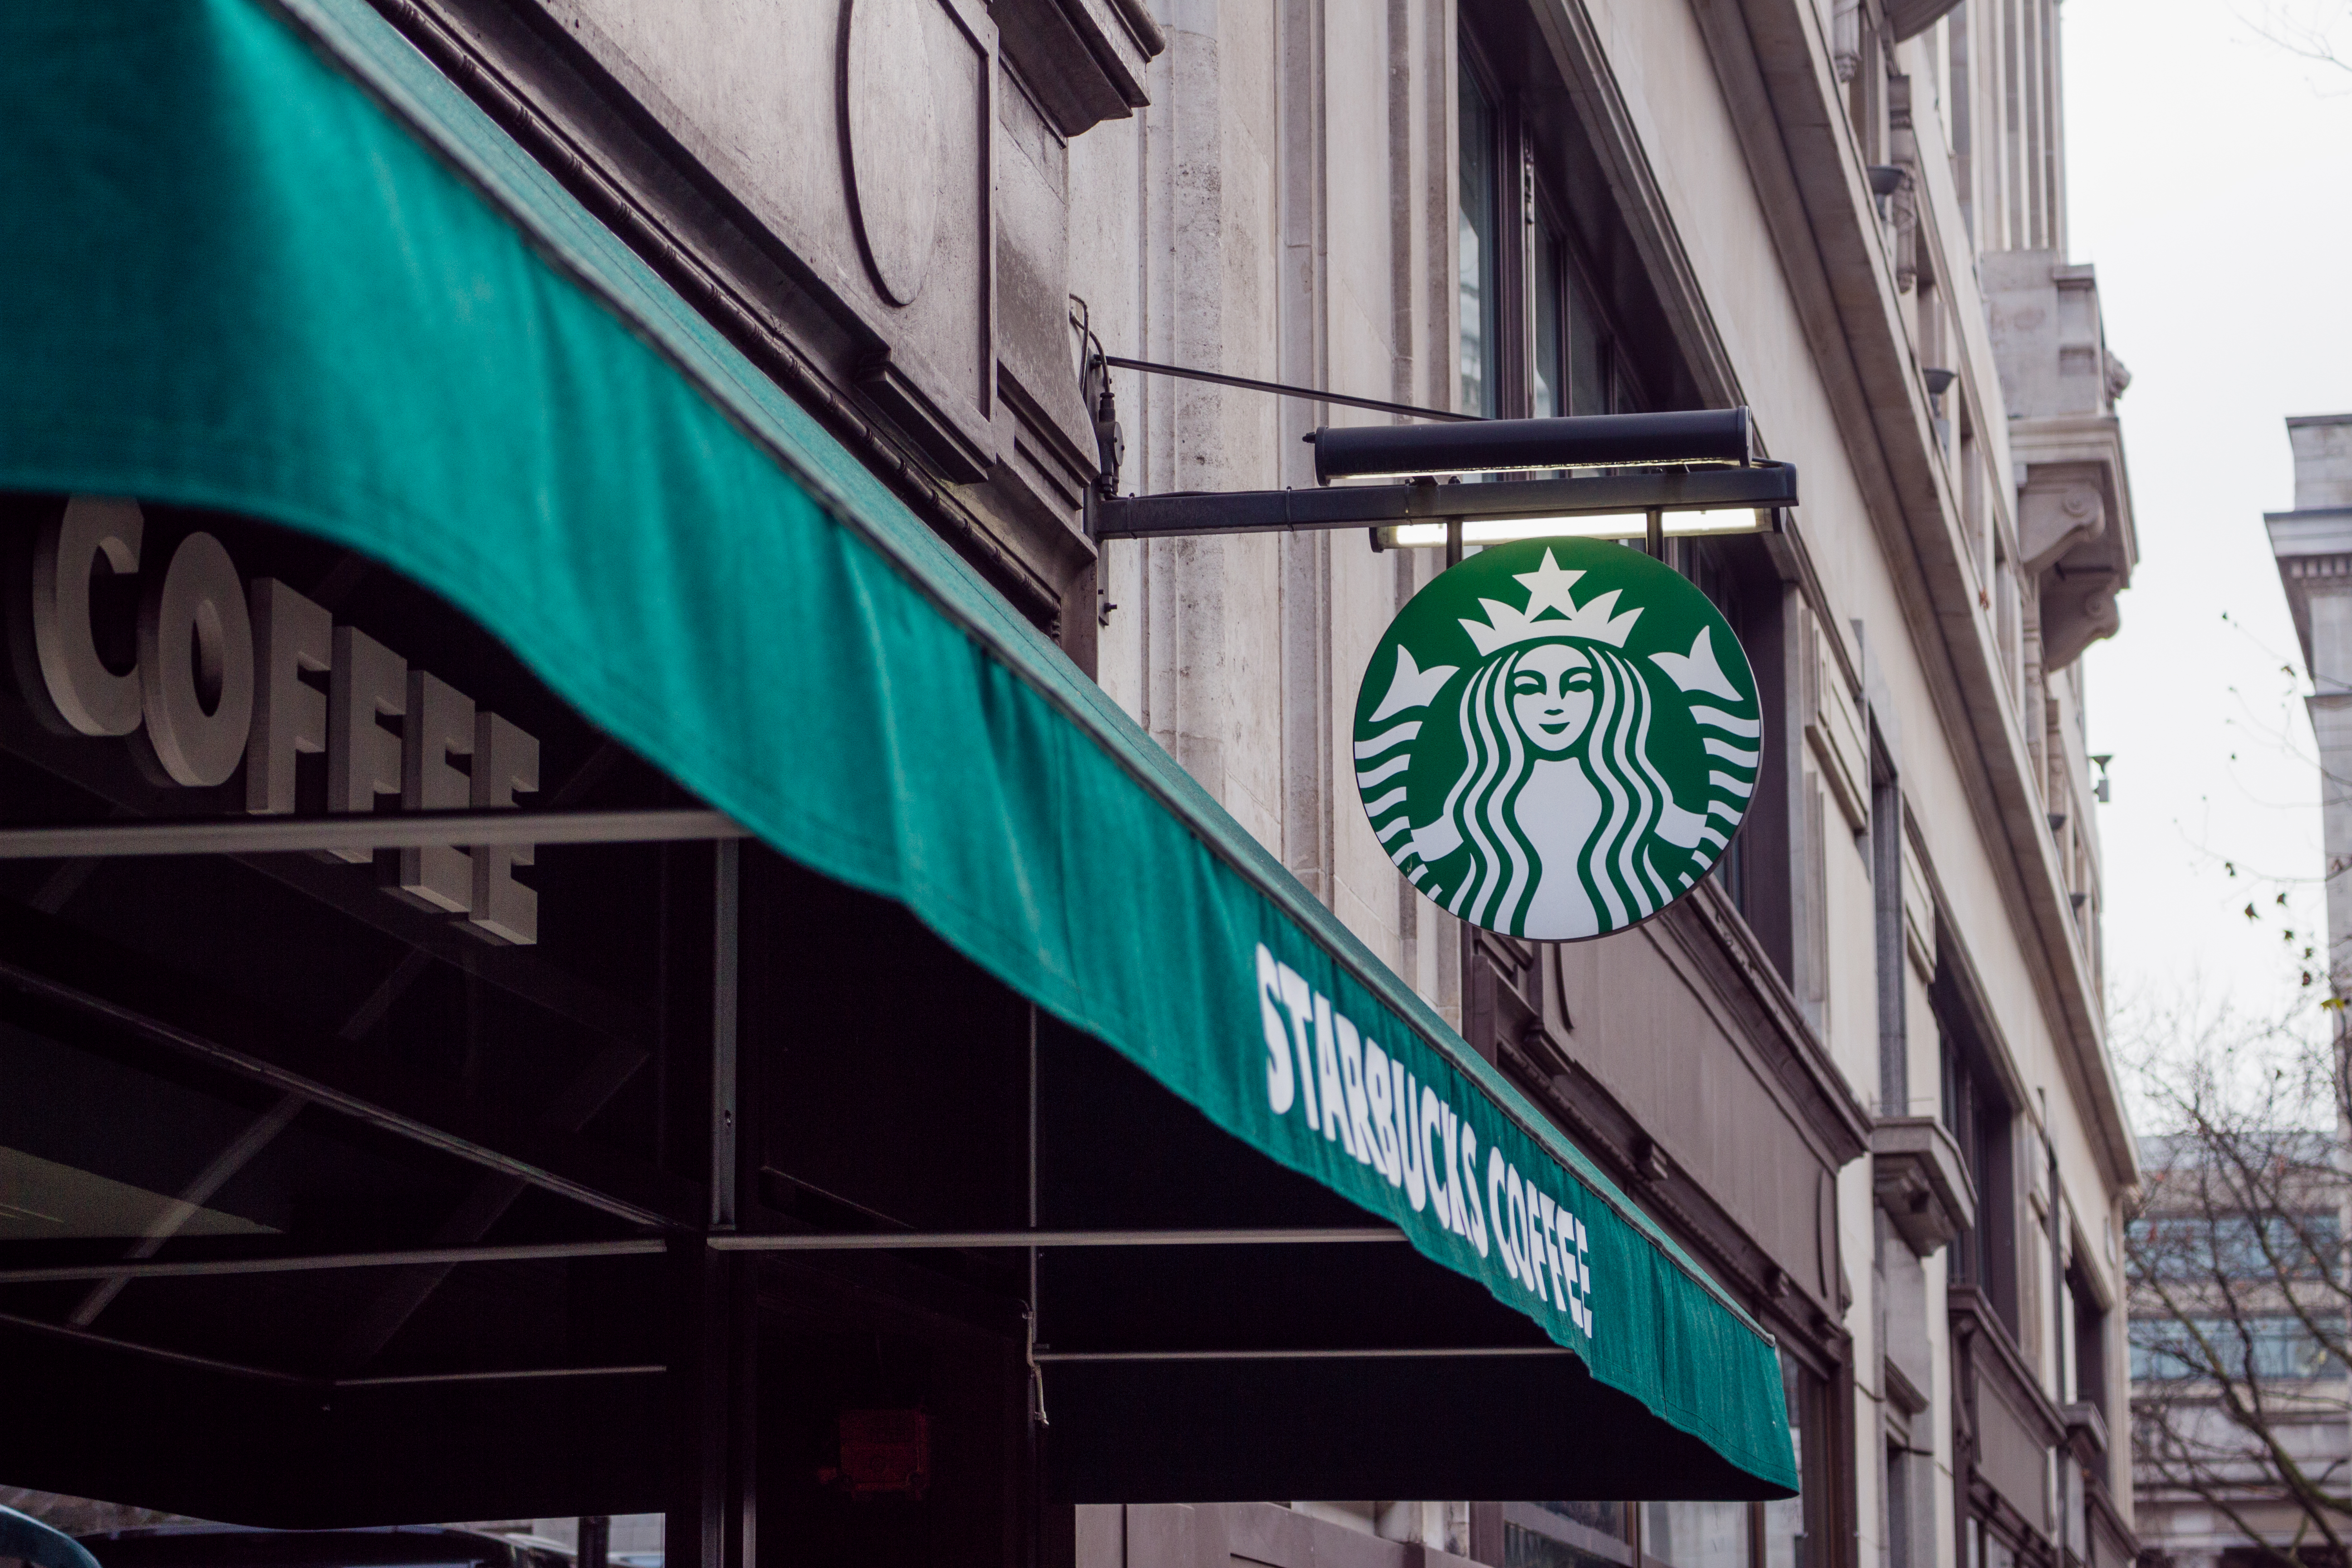 A Starbucks coffee store.